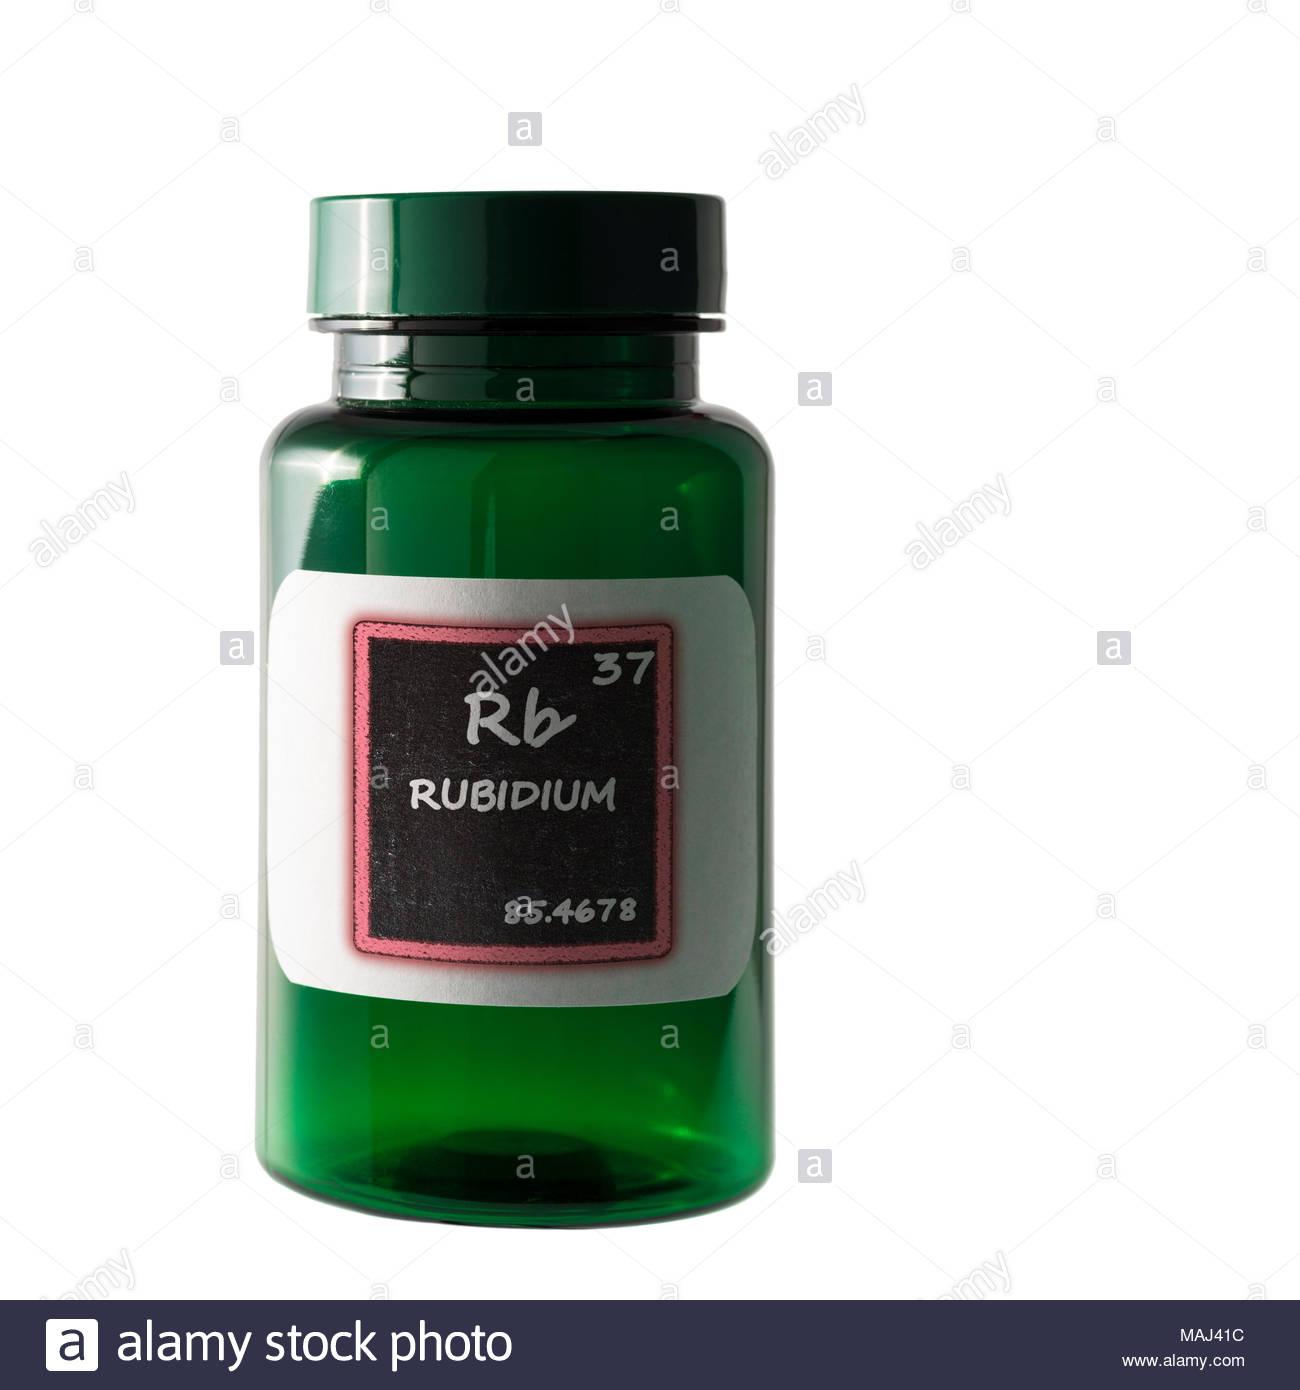 Rubidium Periodic Table Details Shown On Bottle Label Stock Photo